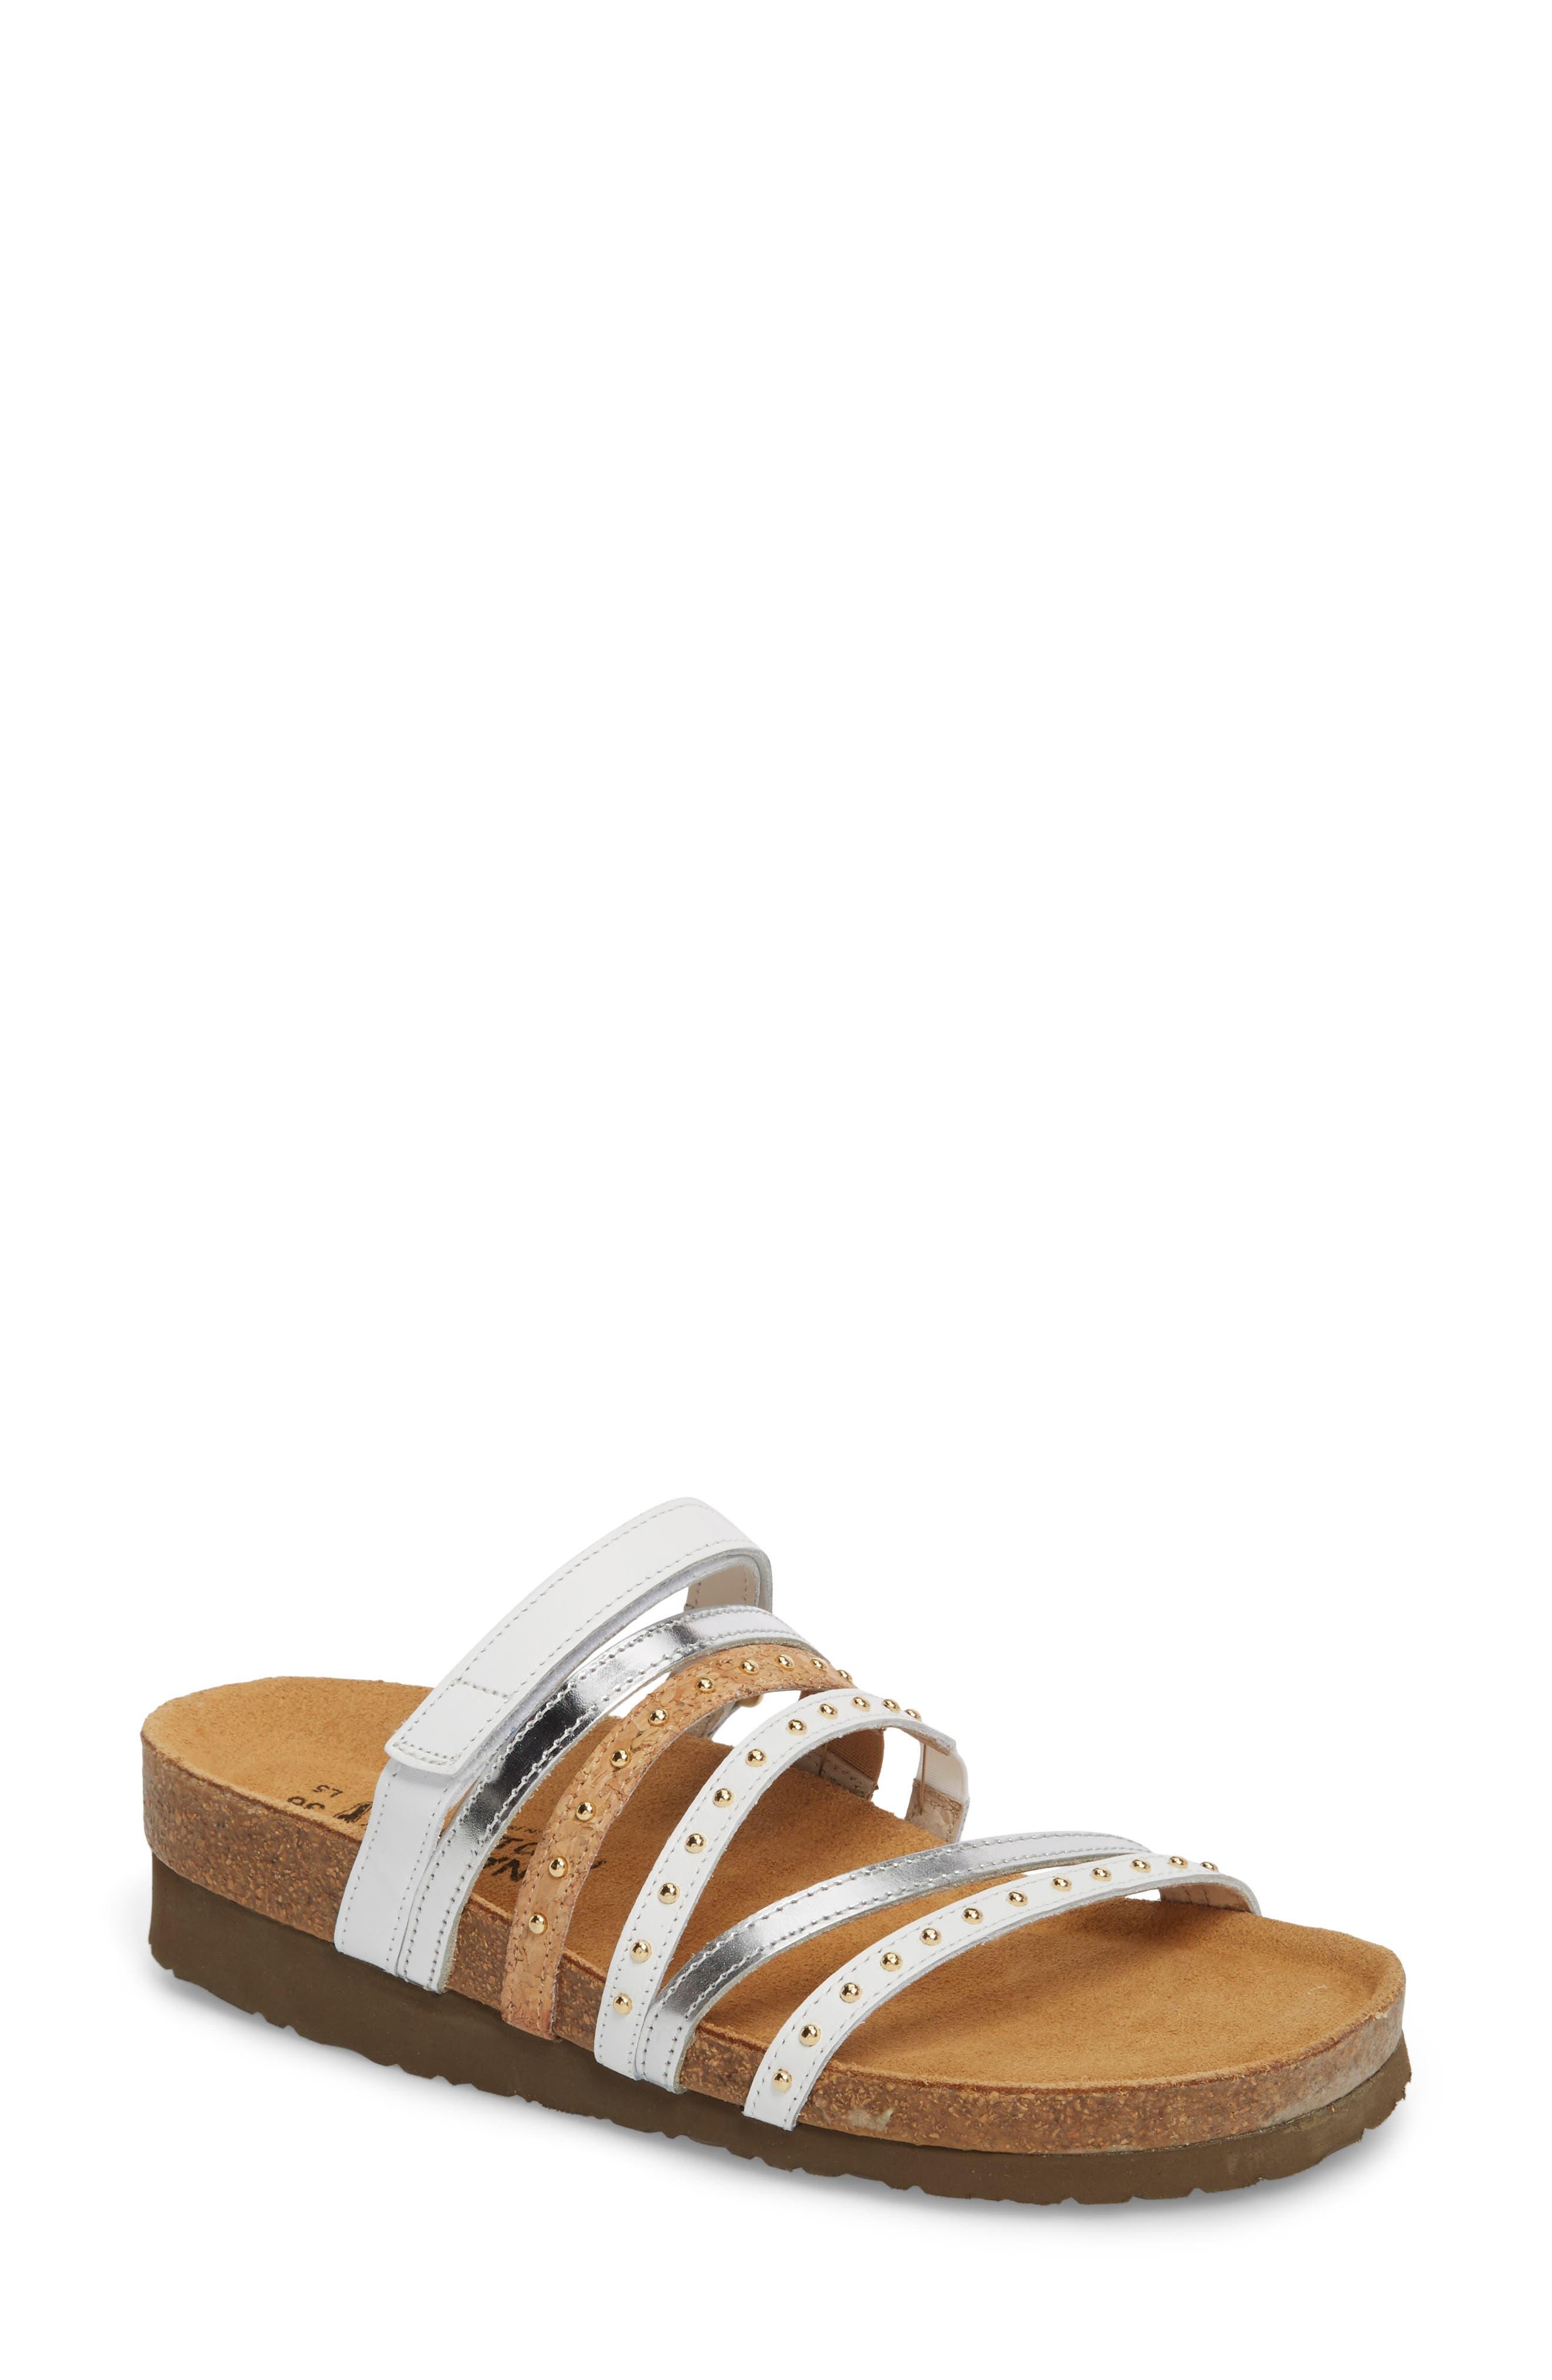 Prescott Sandal,                             Main thumbnail 1, color,                             White/ Silver Leather